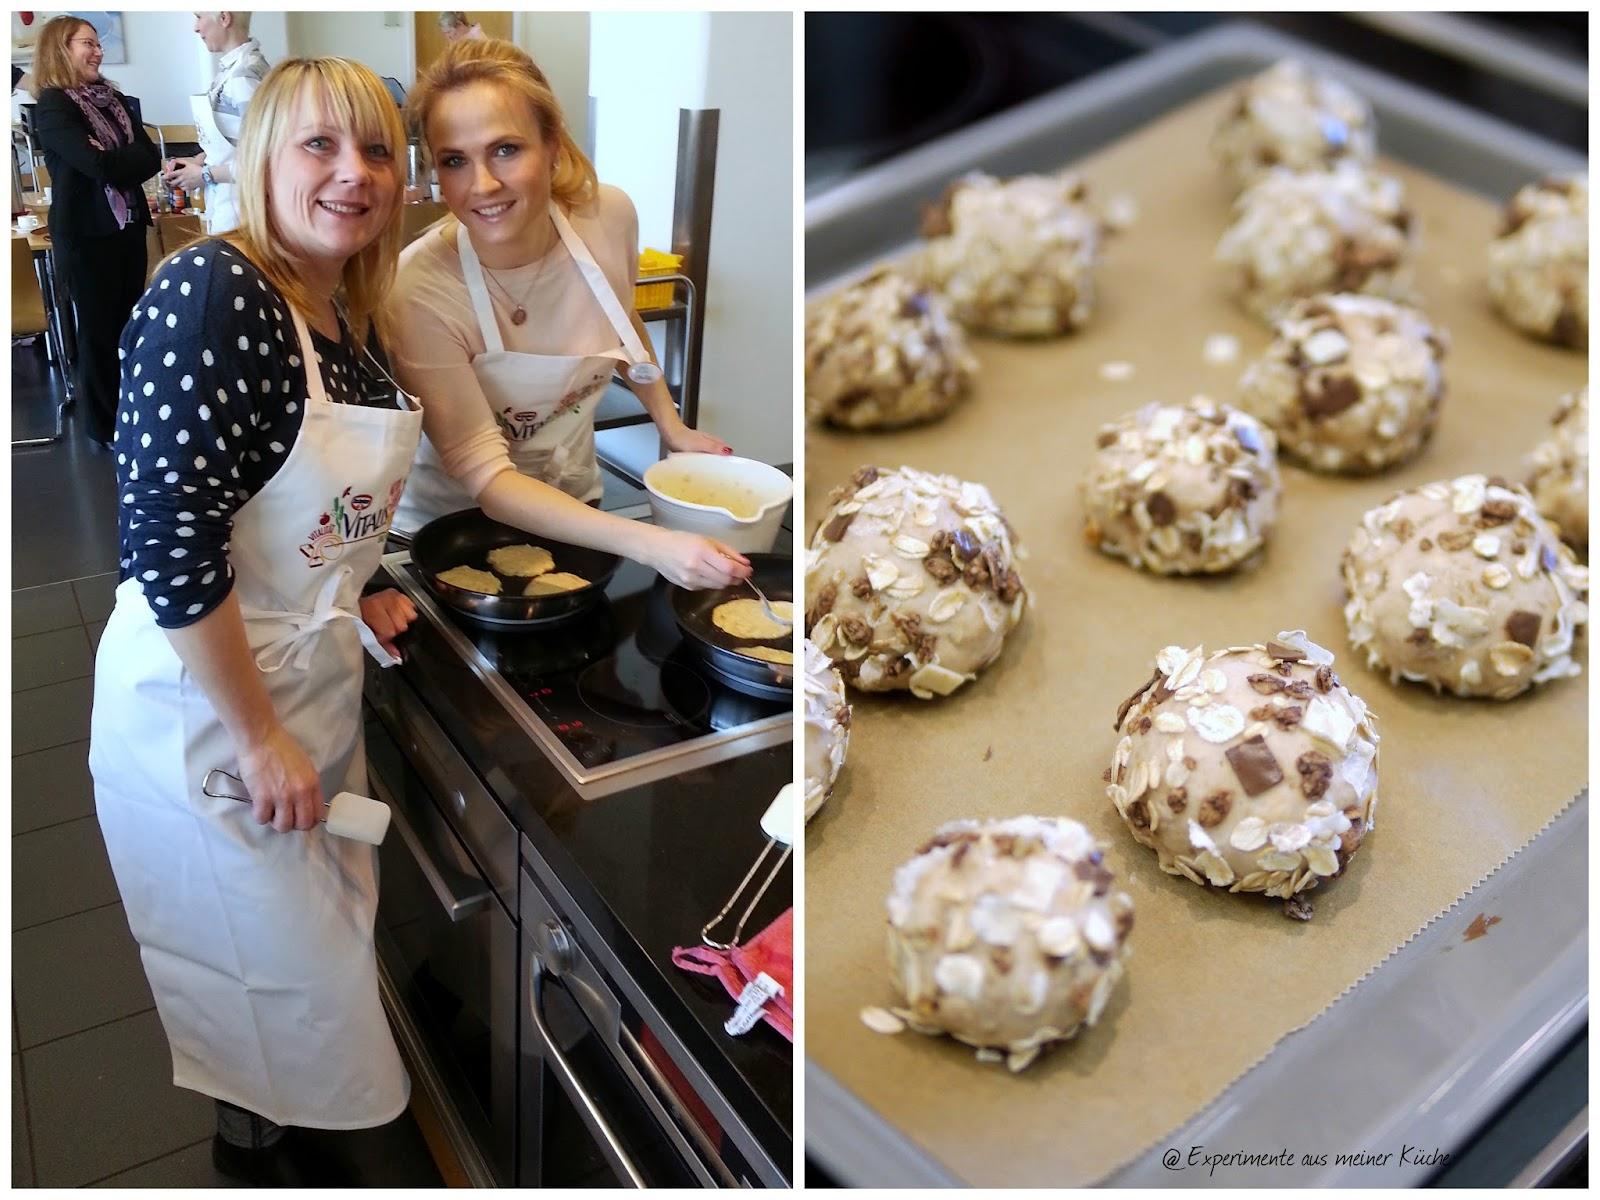 Experimente aus meiner Küche: Dr. Oetker Vitalis Bloggerworkshop